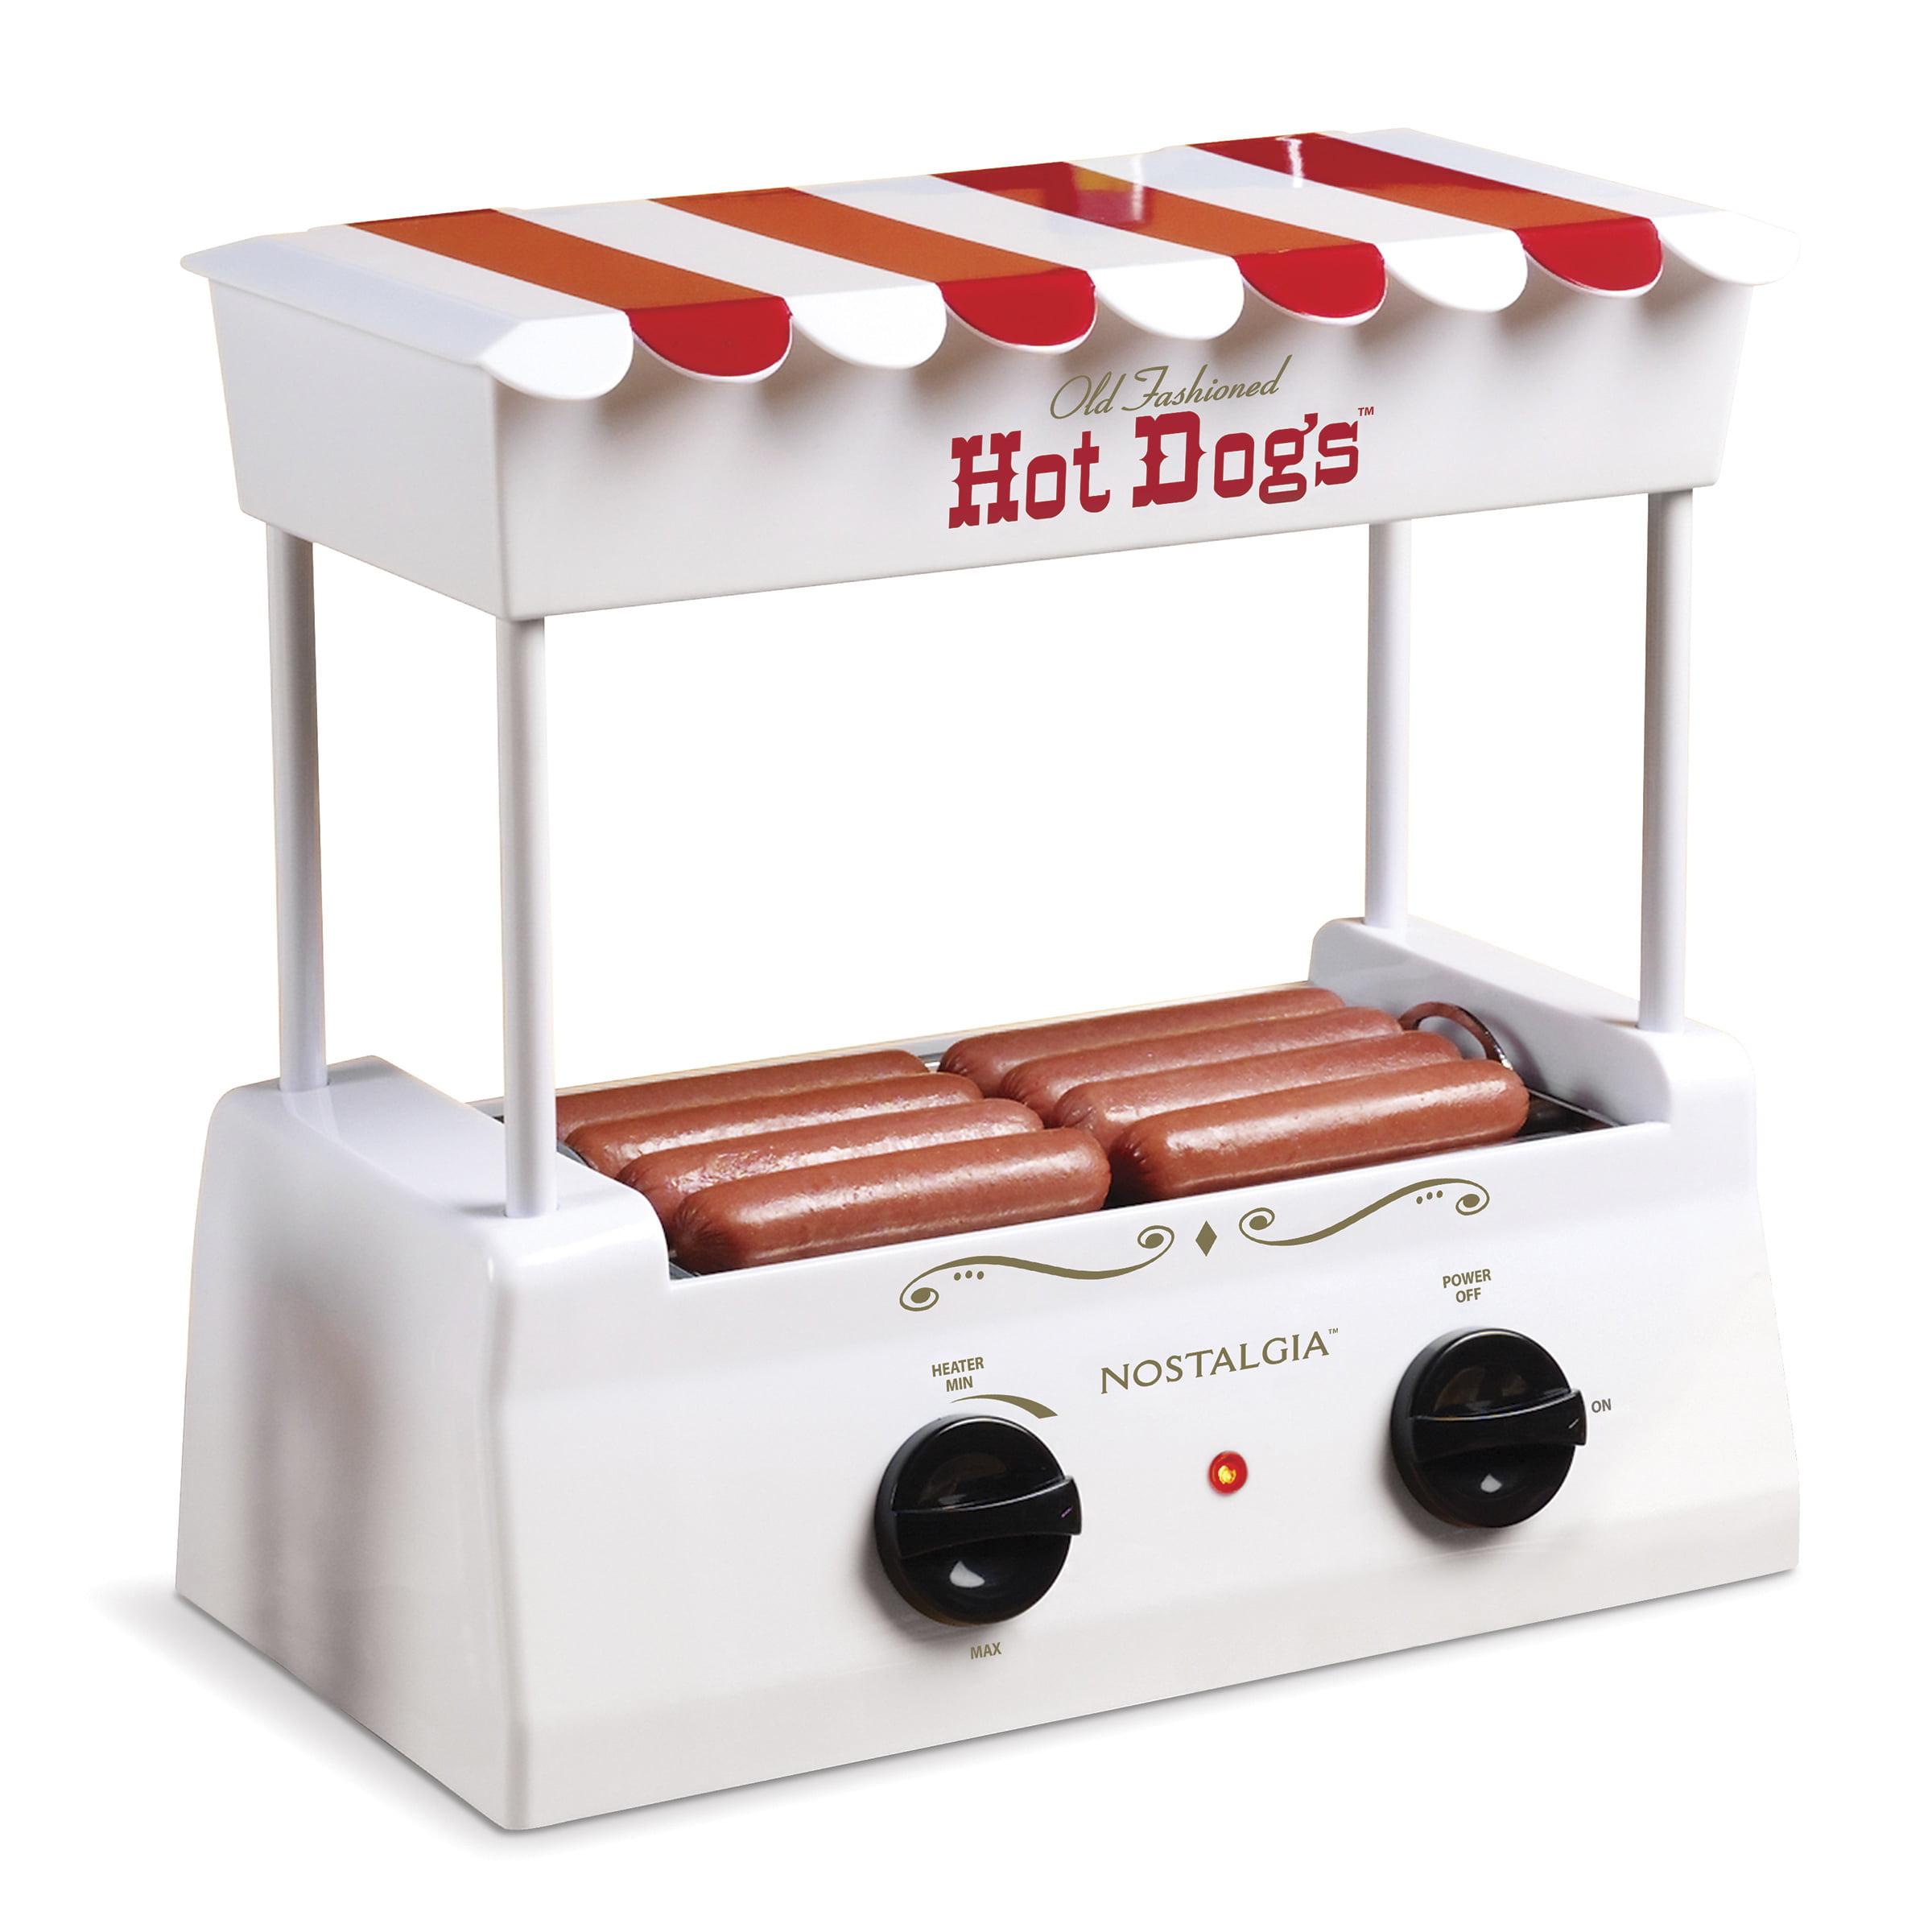 Nostalgia HDR565 Hot Dog Roller and Bun Warmer